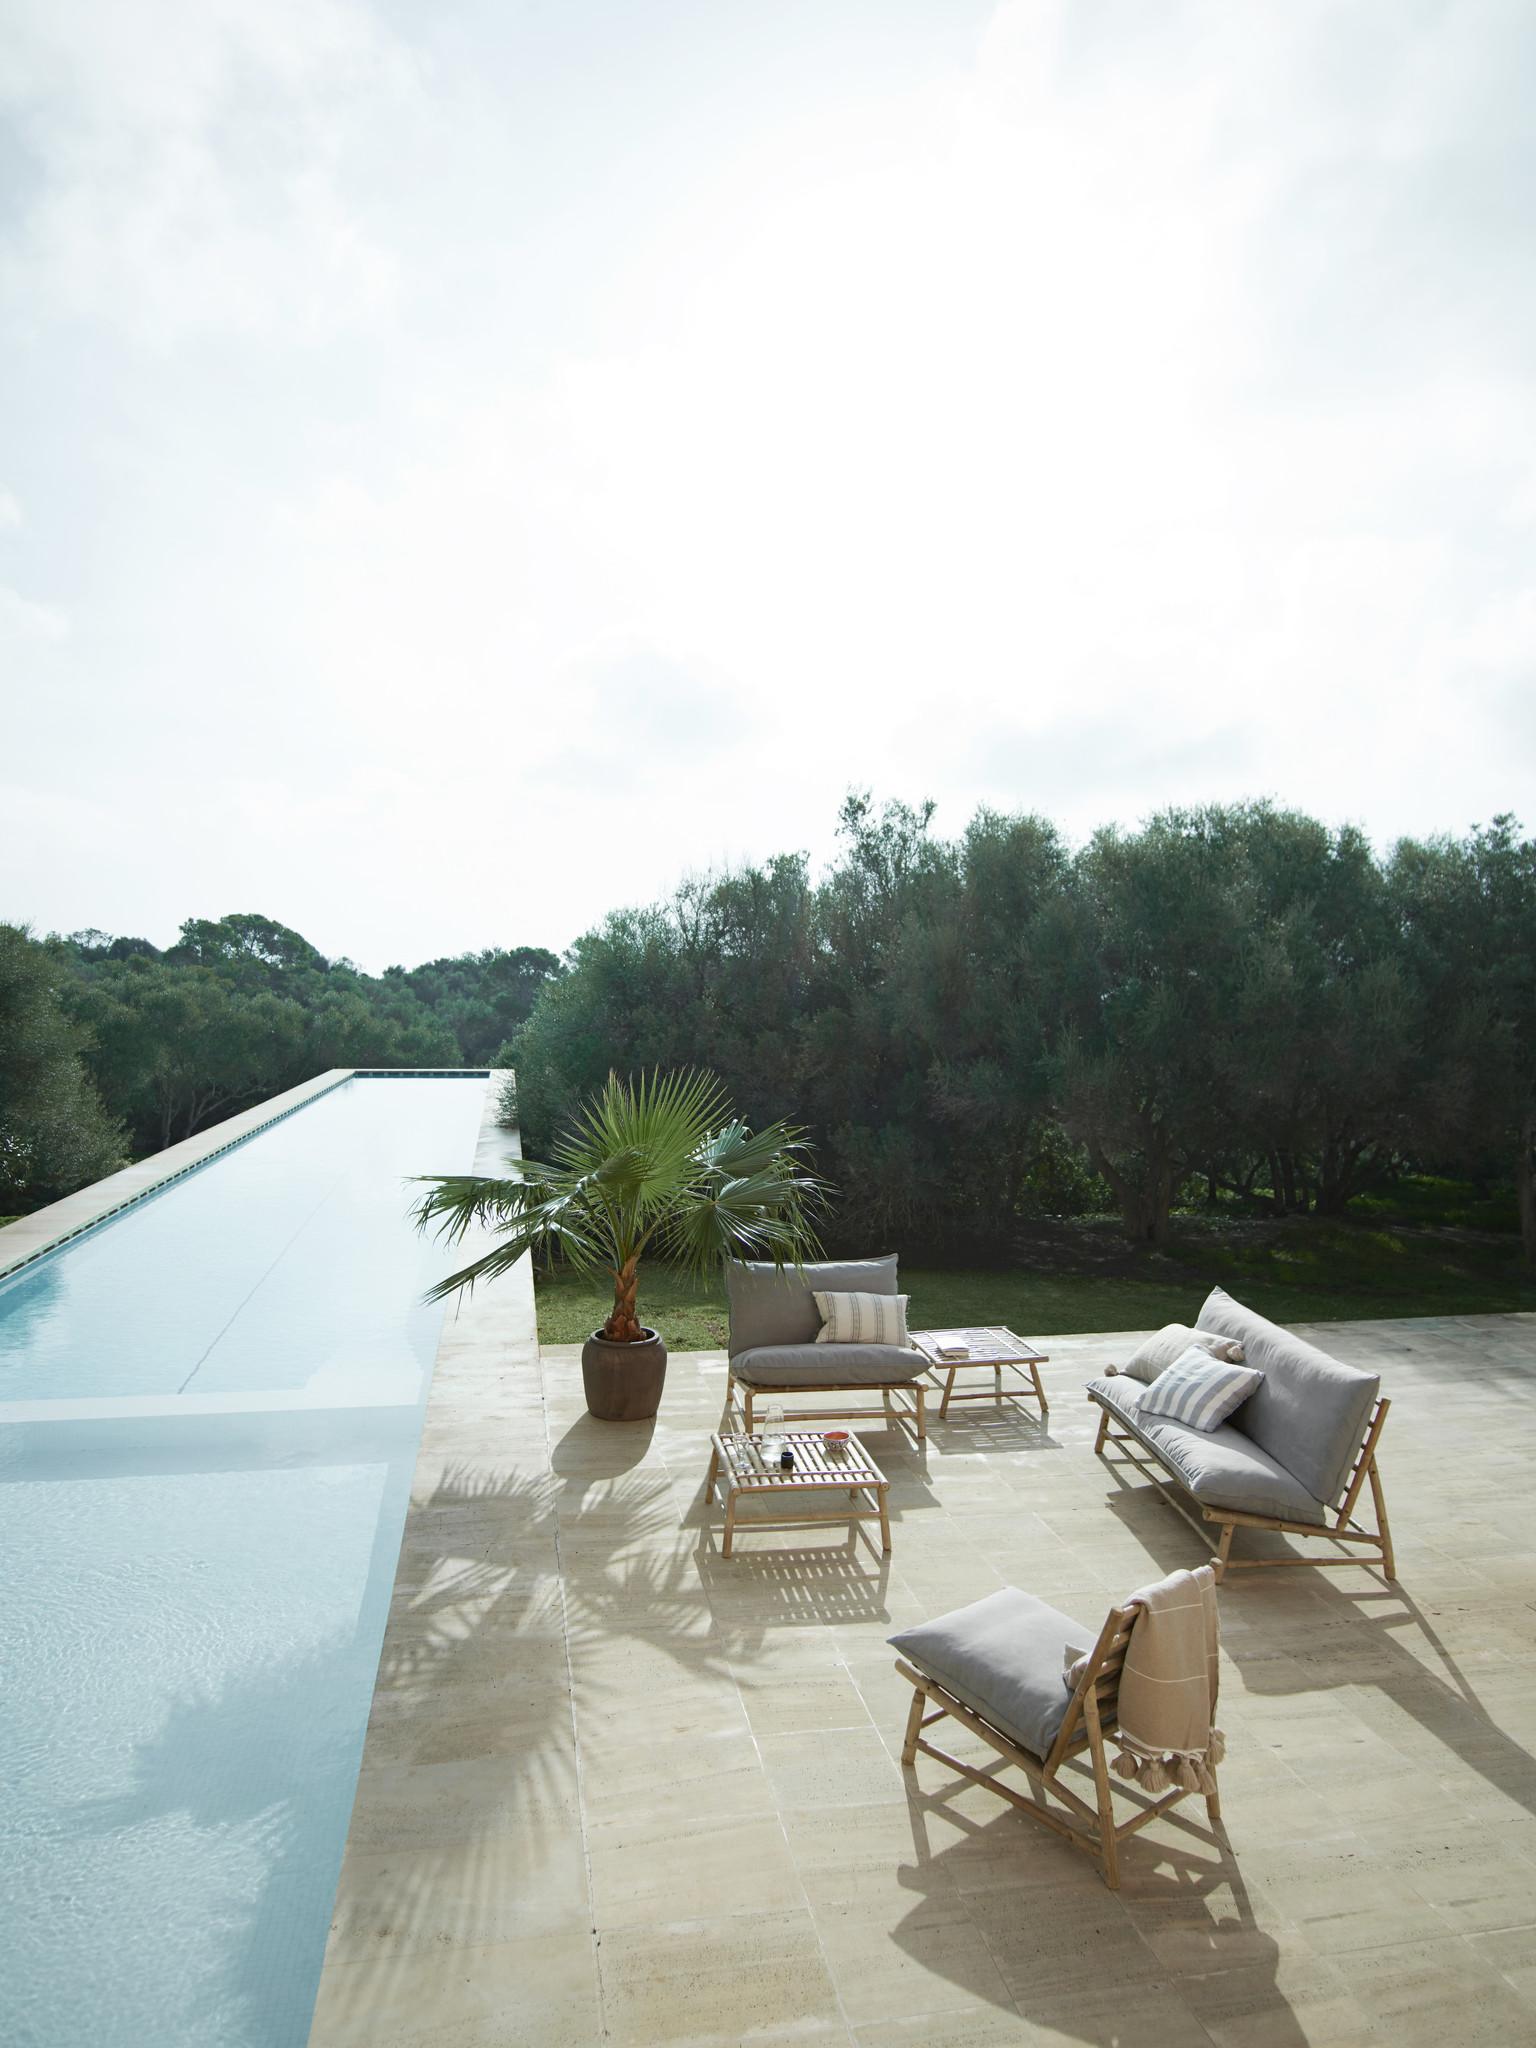 TineKHome Chaise lounge de jardin bambou - gris / naturel - 55x87xh45/80cm